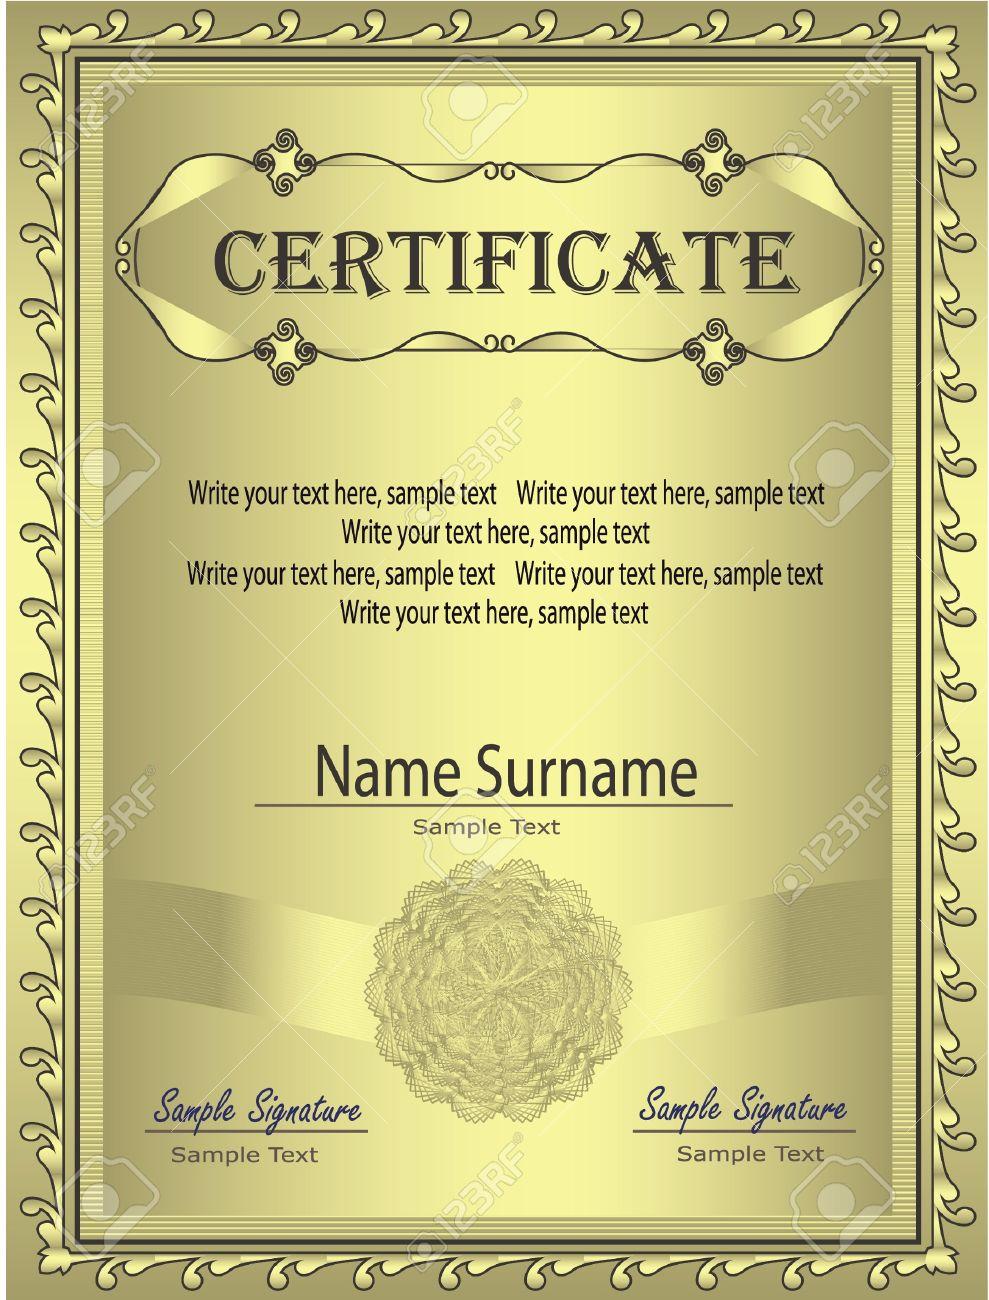 Certificate Gold frame vector Stock Vector - 9316273